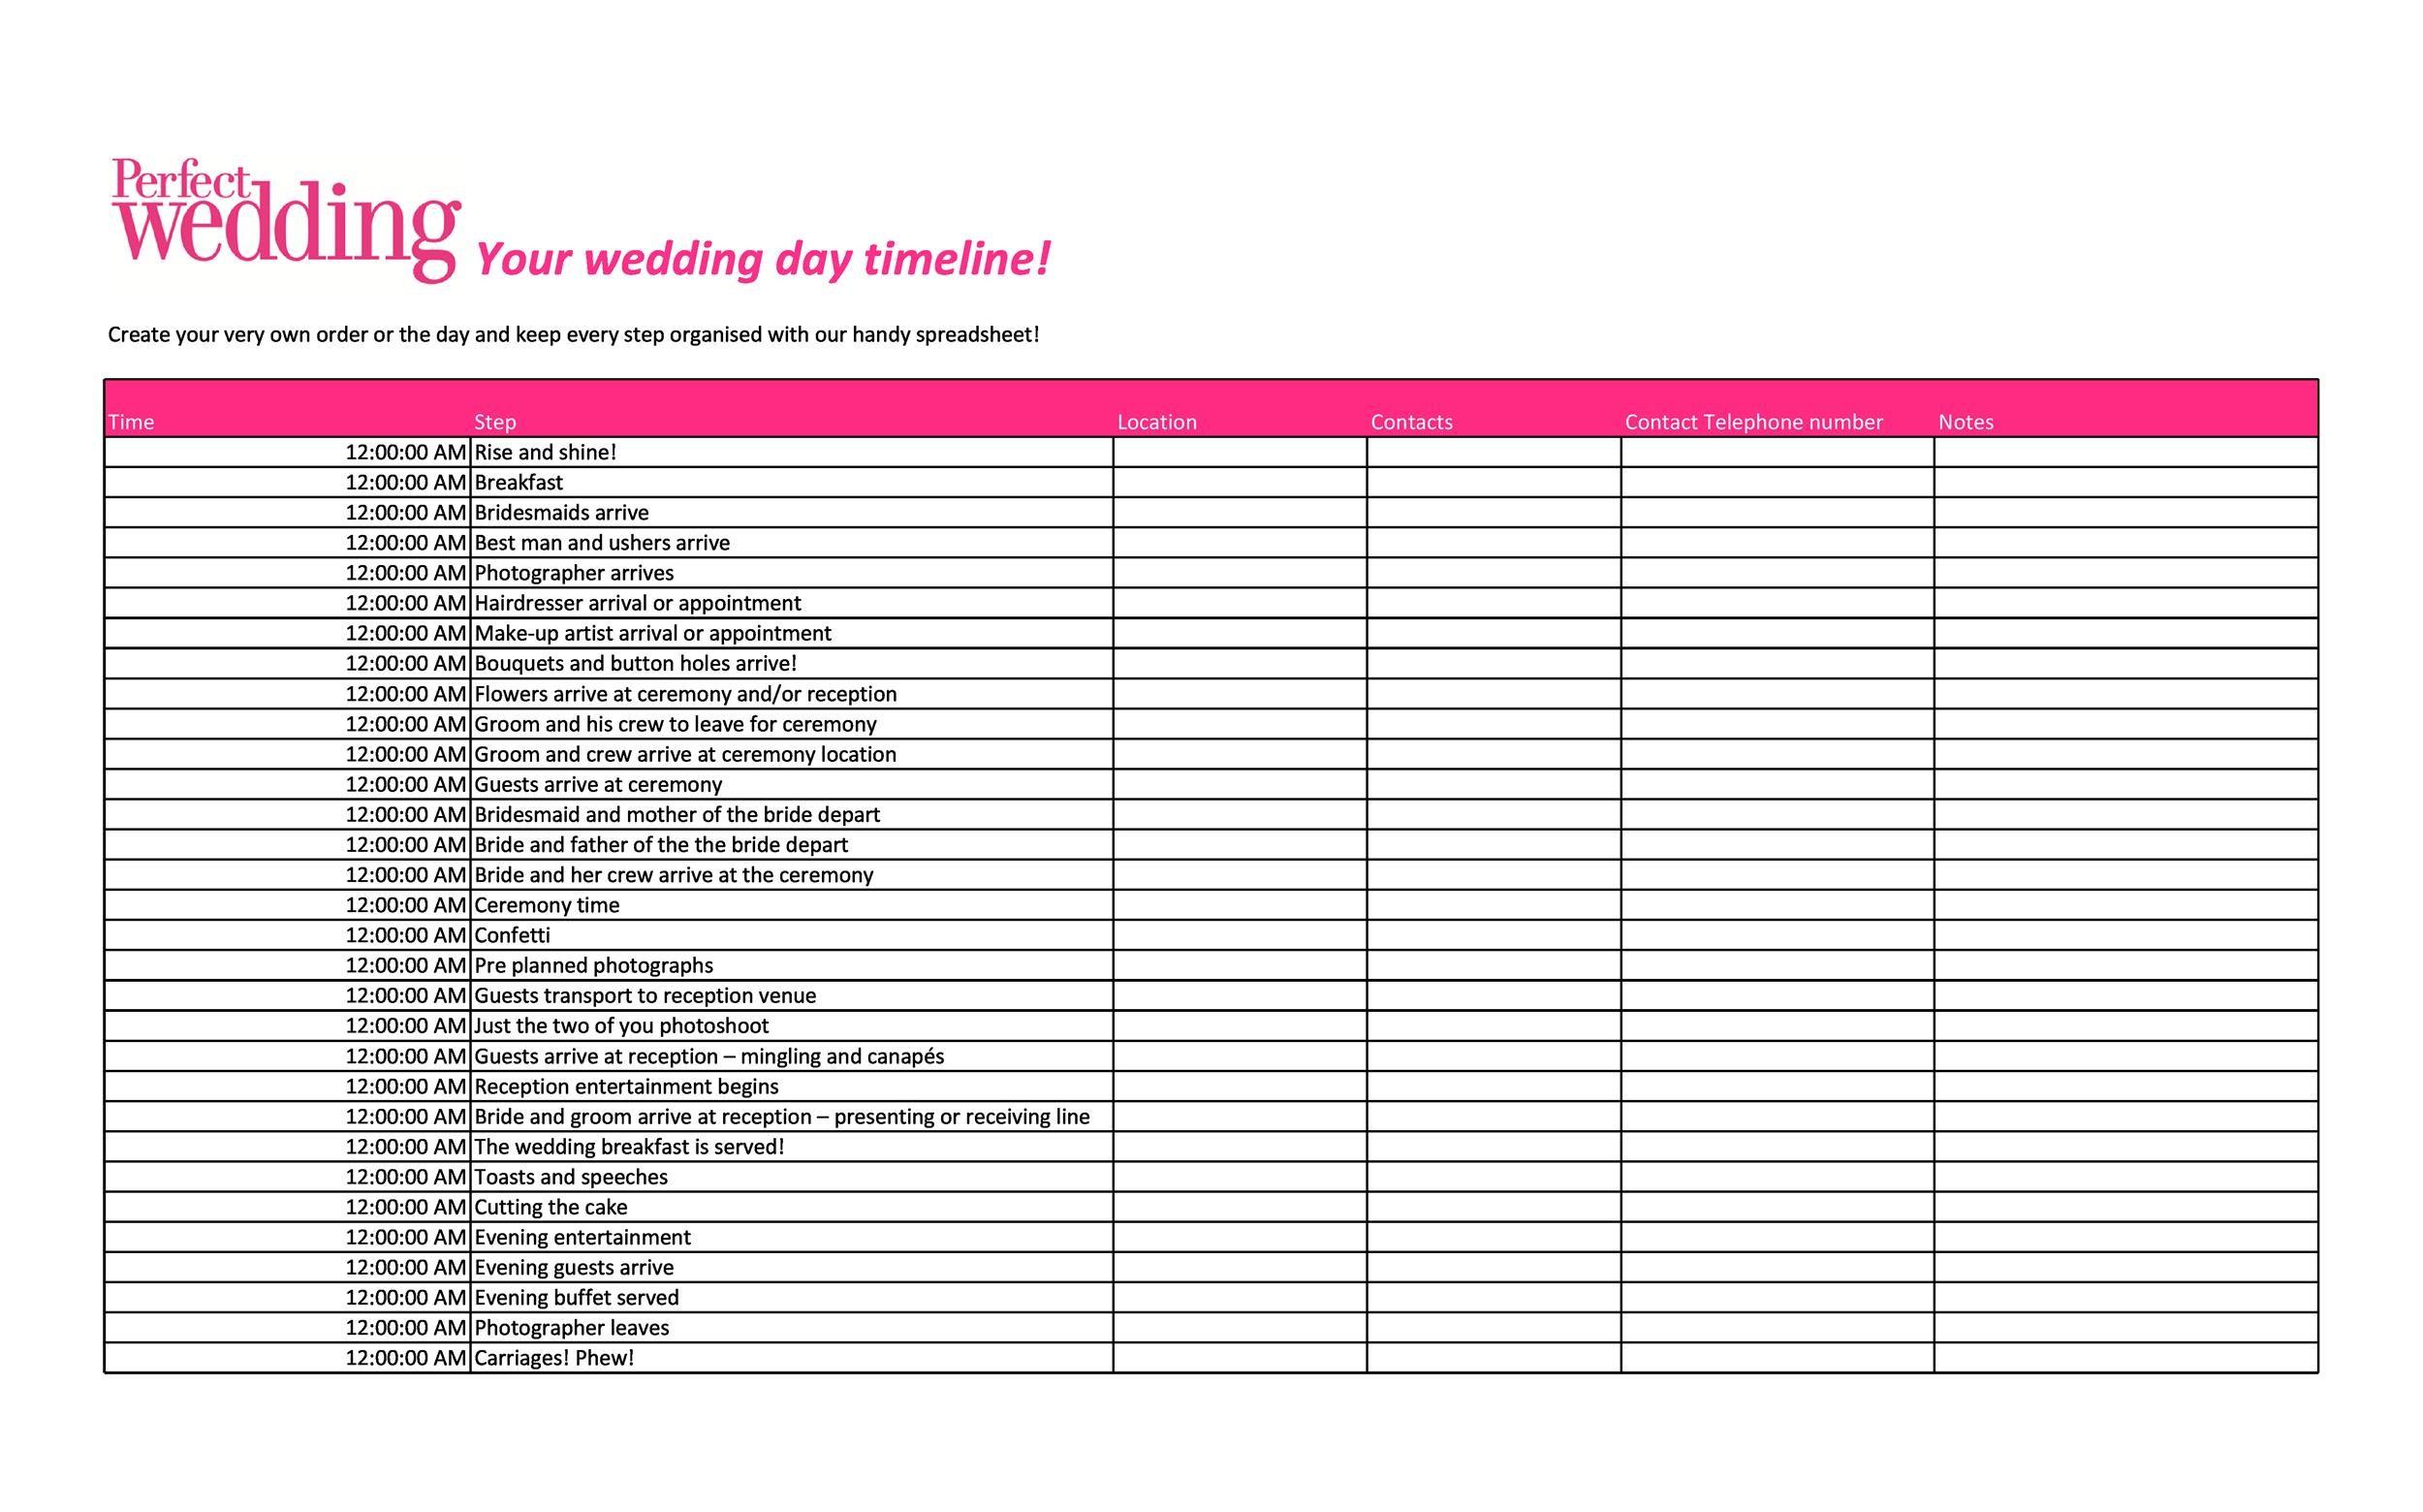 35+ Beautiful Wedding Guest List & Itinerary Templates